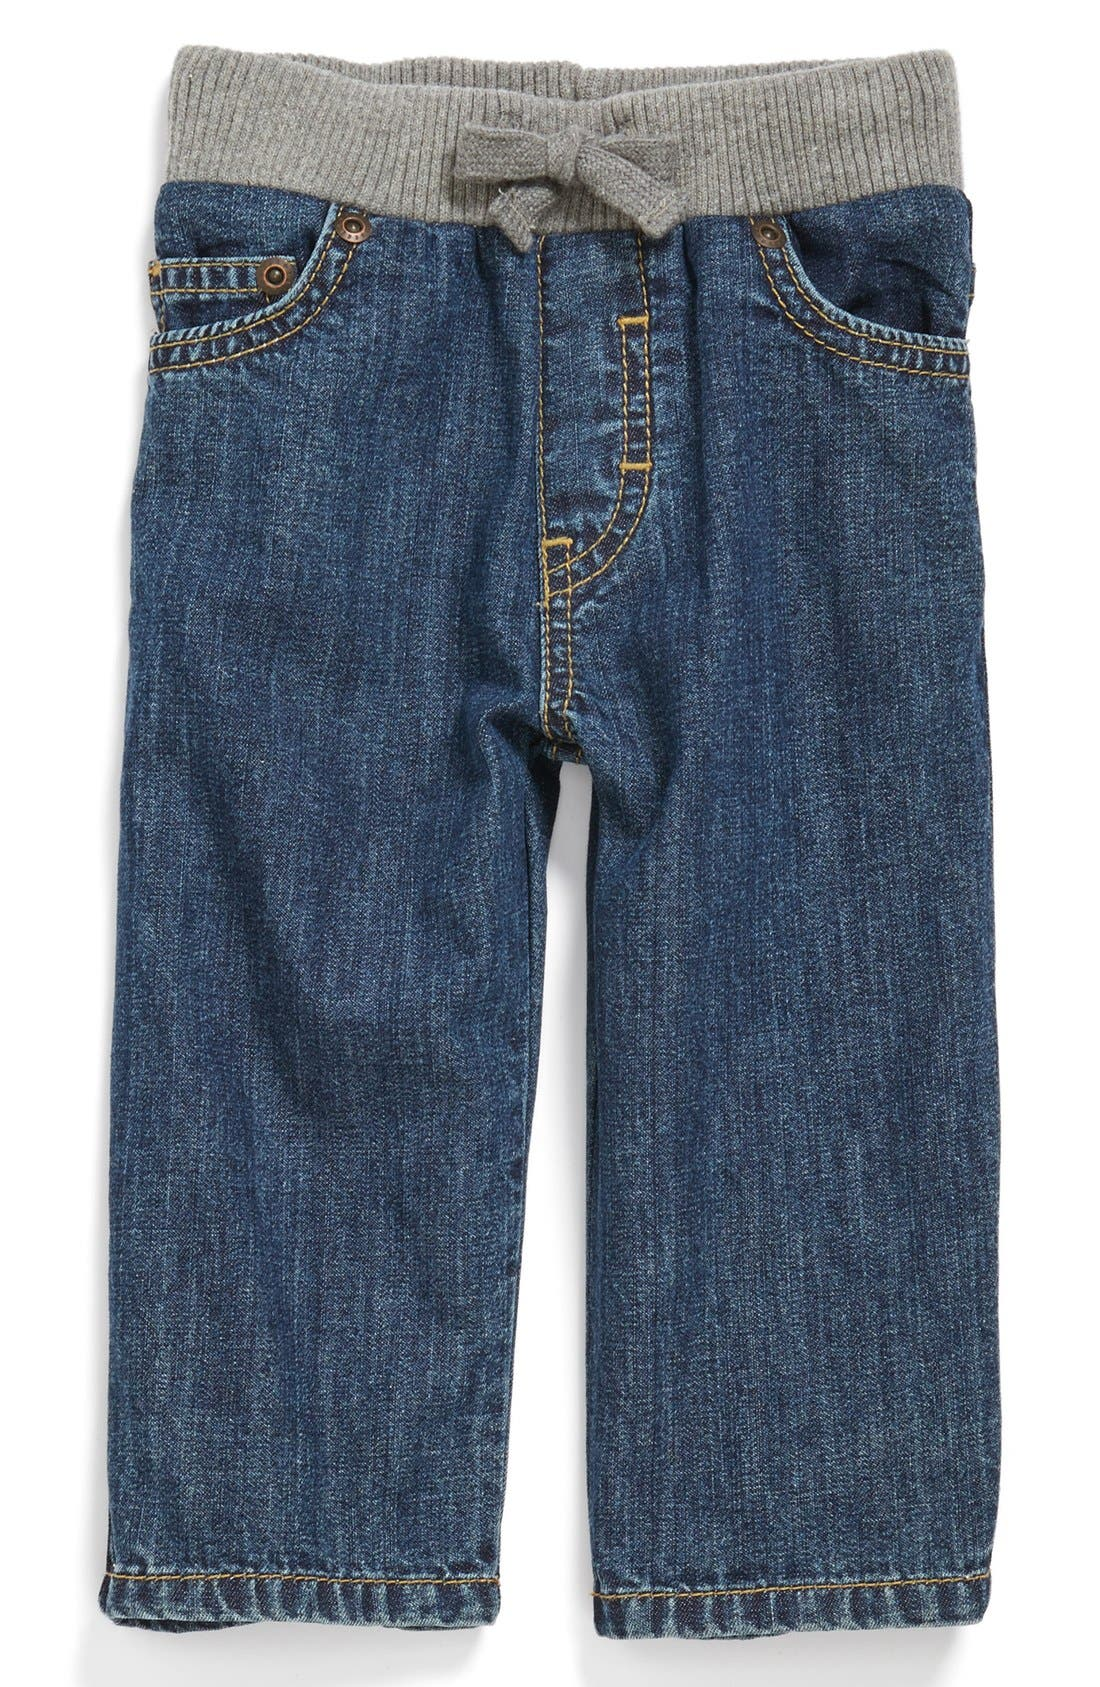 Alternate Image 1 Selected - Tucker + Tate 'Tucker' Knit Waist Straight Leg Jeans (Baby Boys)